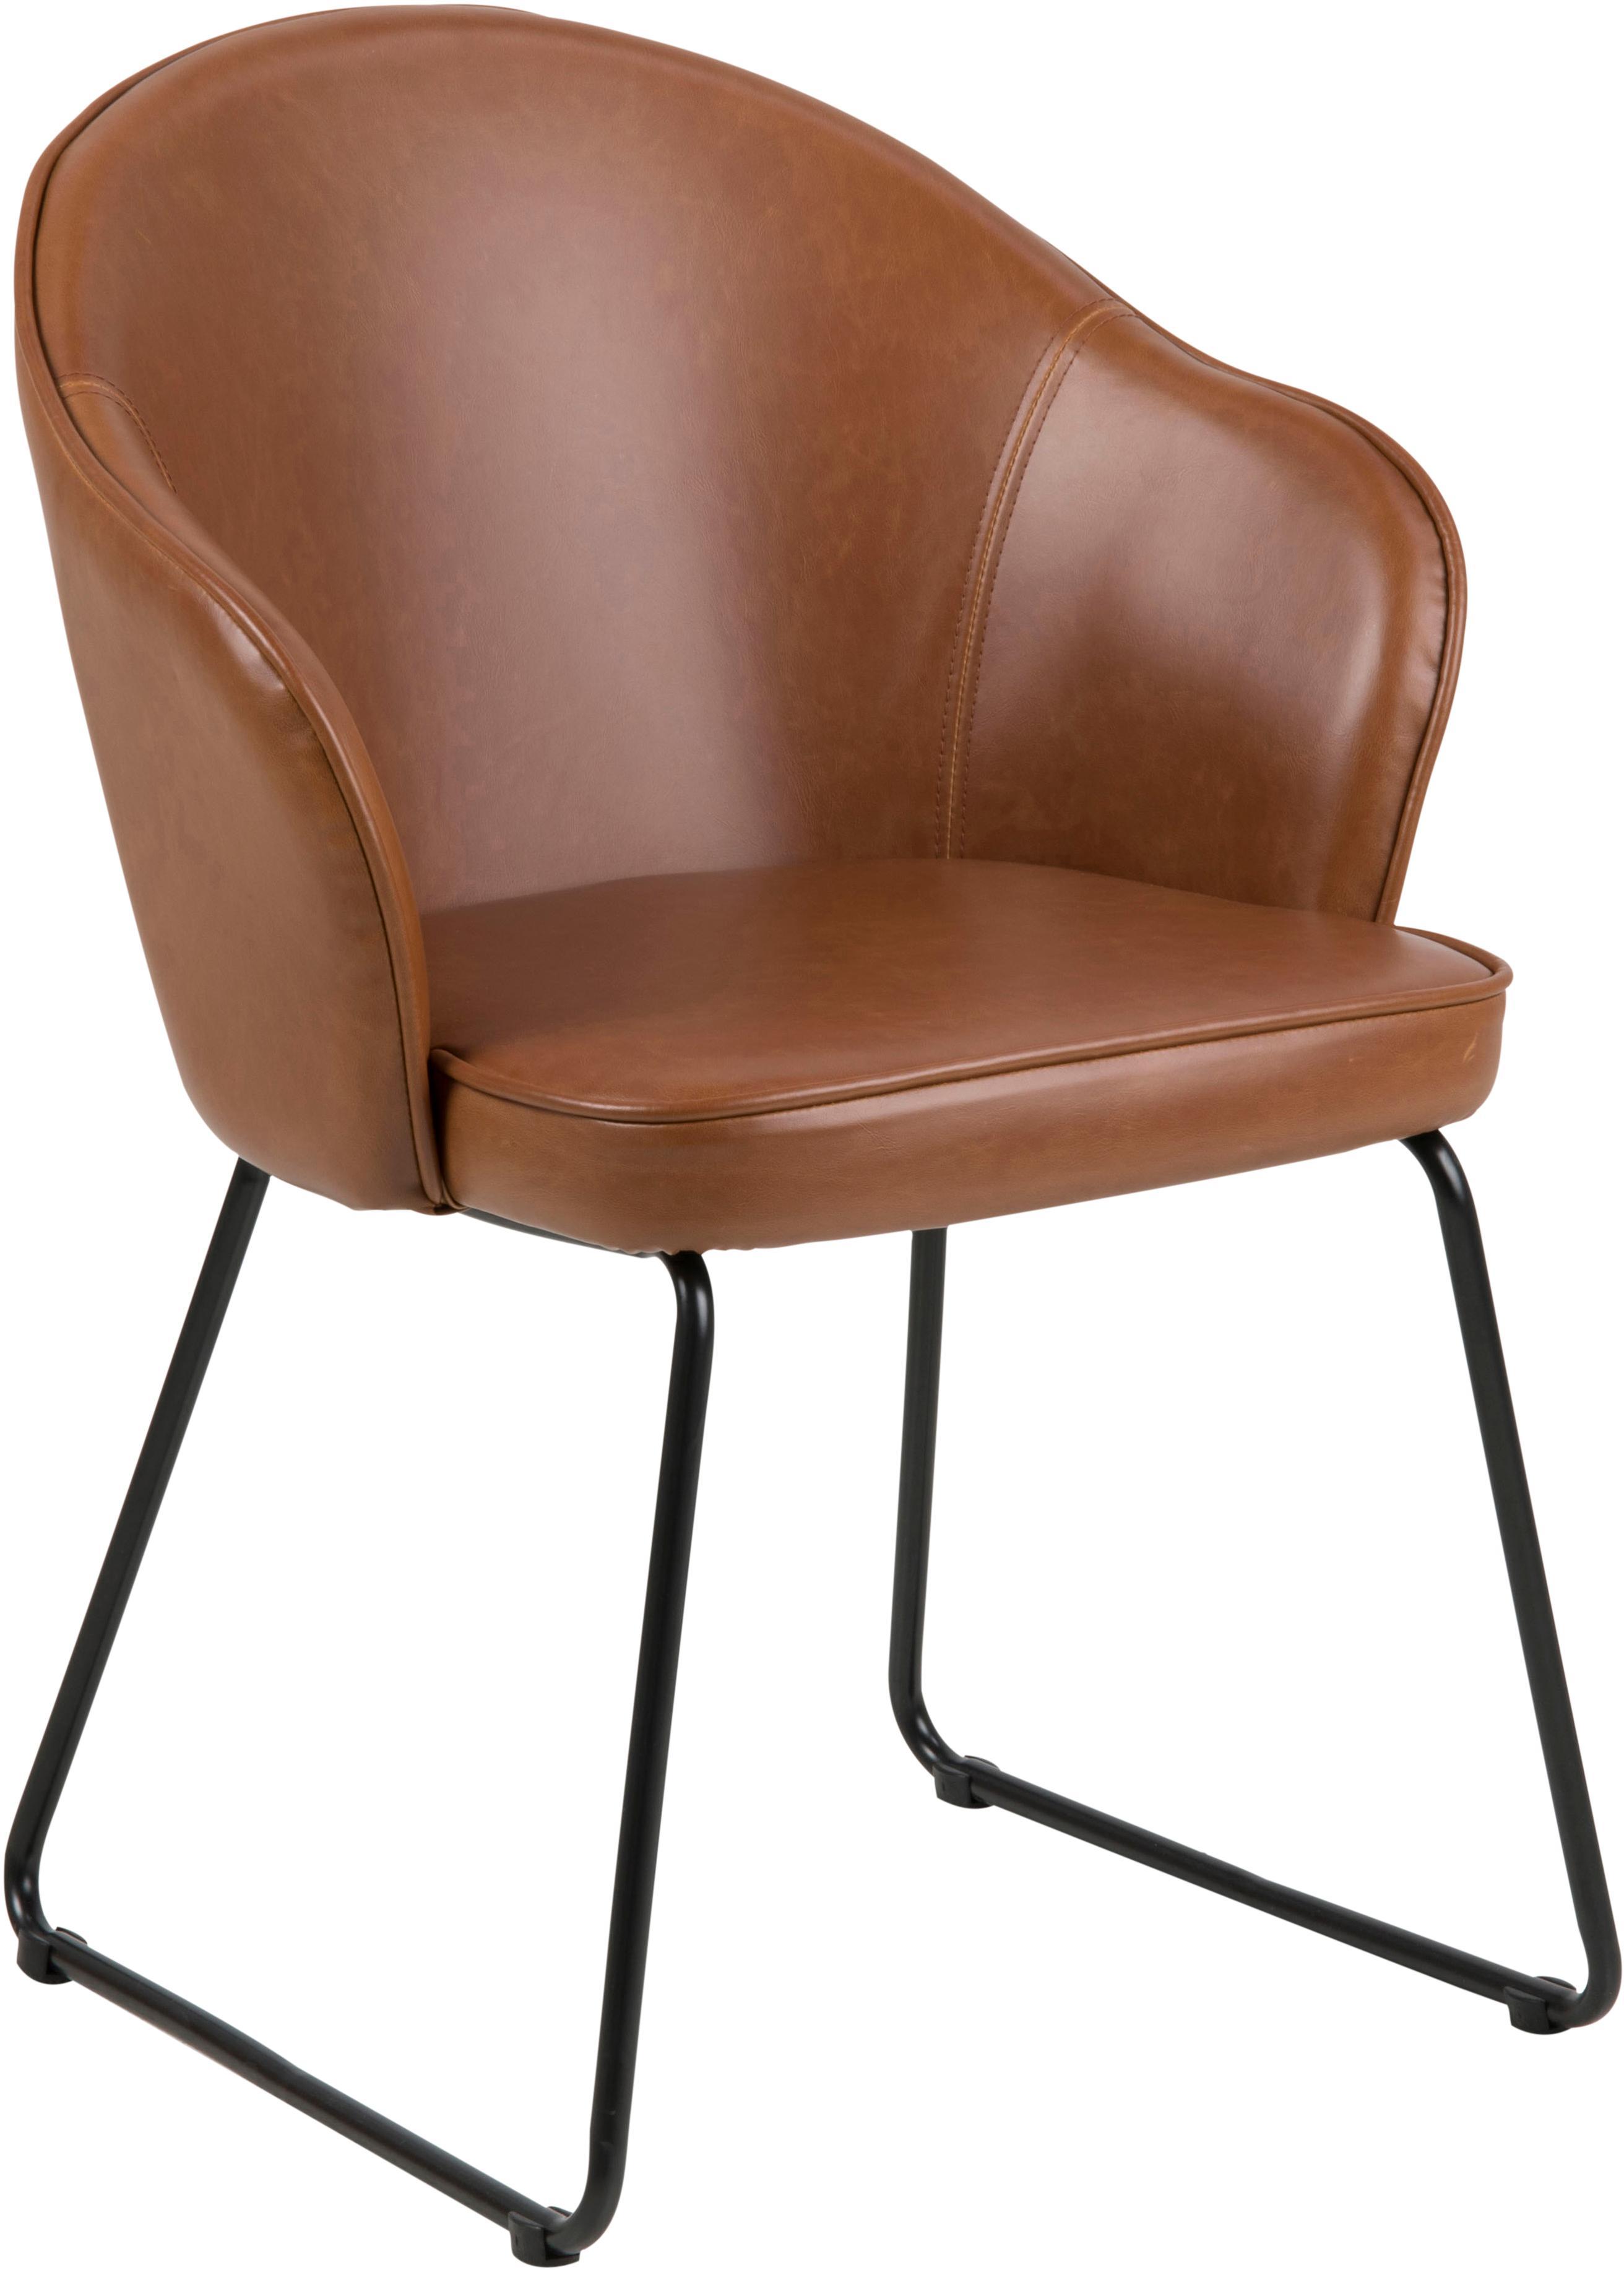 Sedia con braccioli  in similpelle Mitze, Rivestimento: poliuretano (similpelle), Gambe: metallo verniciato, Cognac, nero, L 57 x P 59 cm